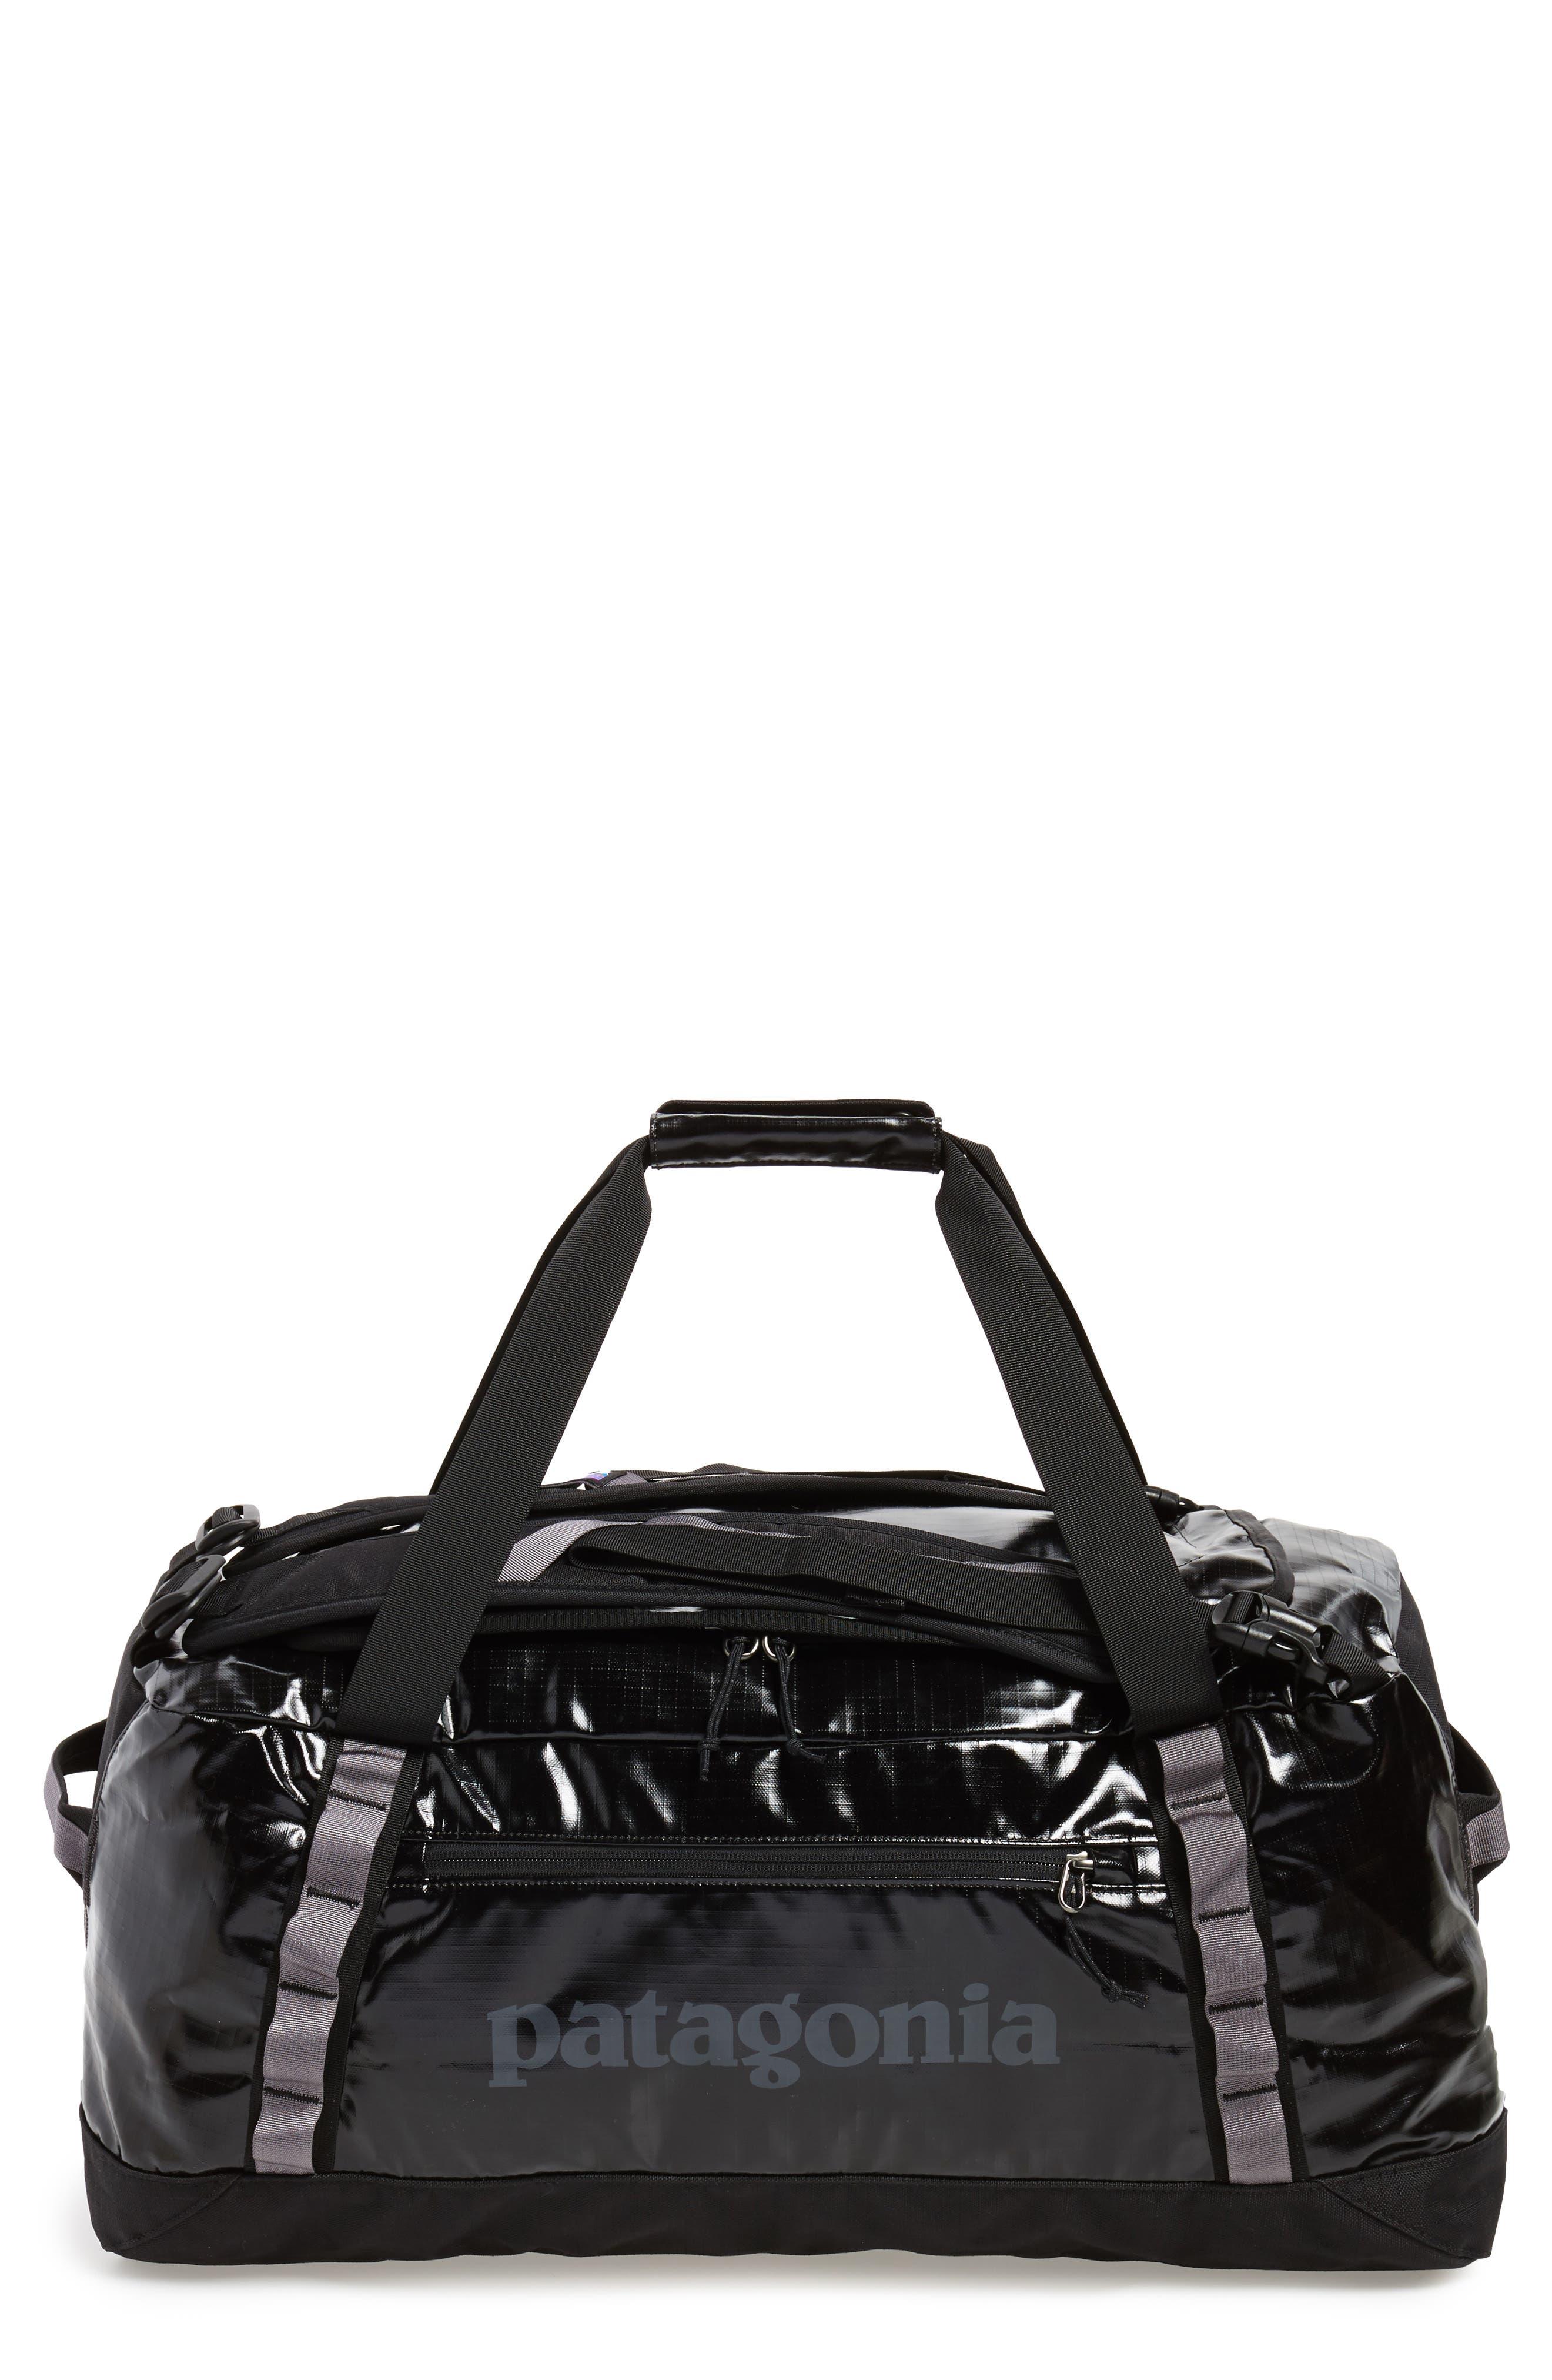 Black Hole Water Repellent Duffel Bag,                             Main thumbnail 1, color,                             001